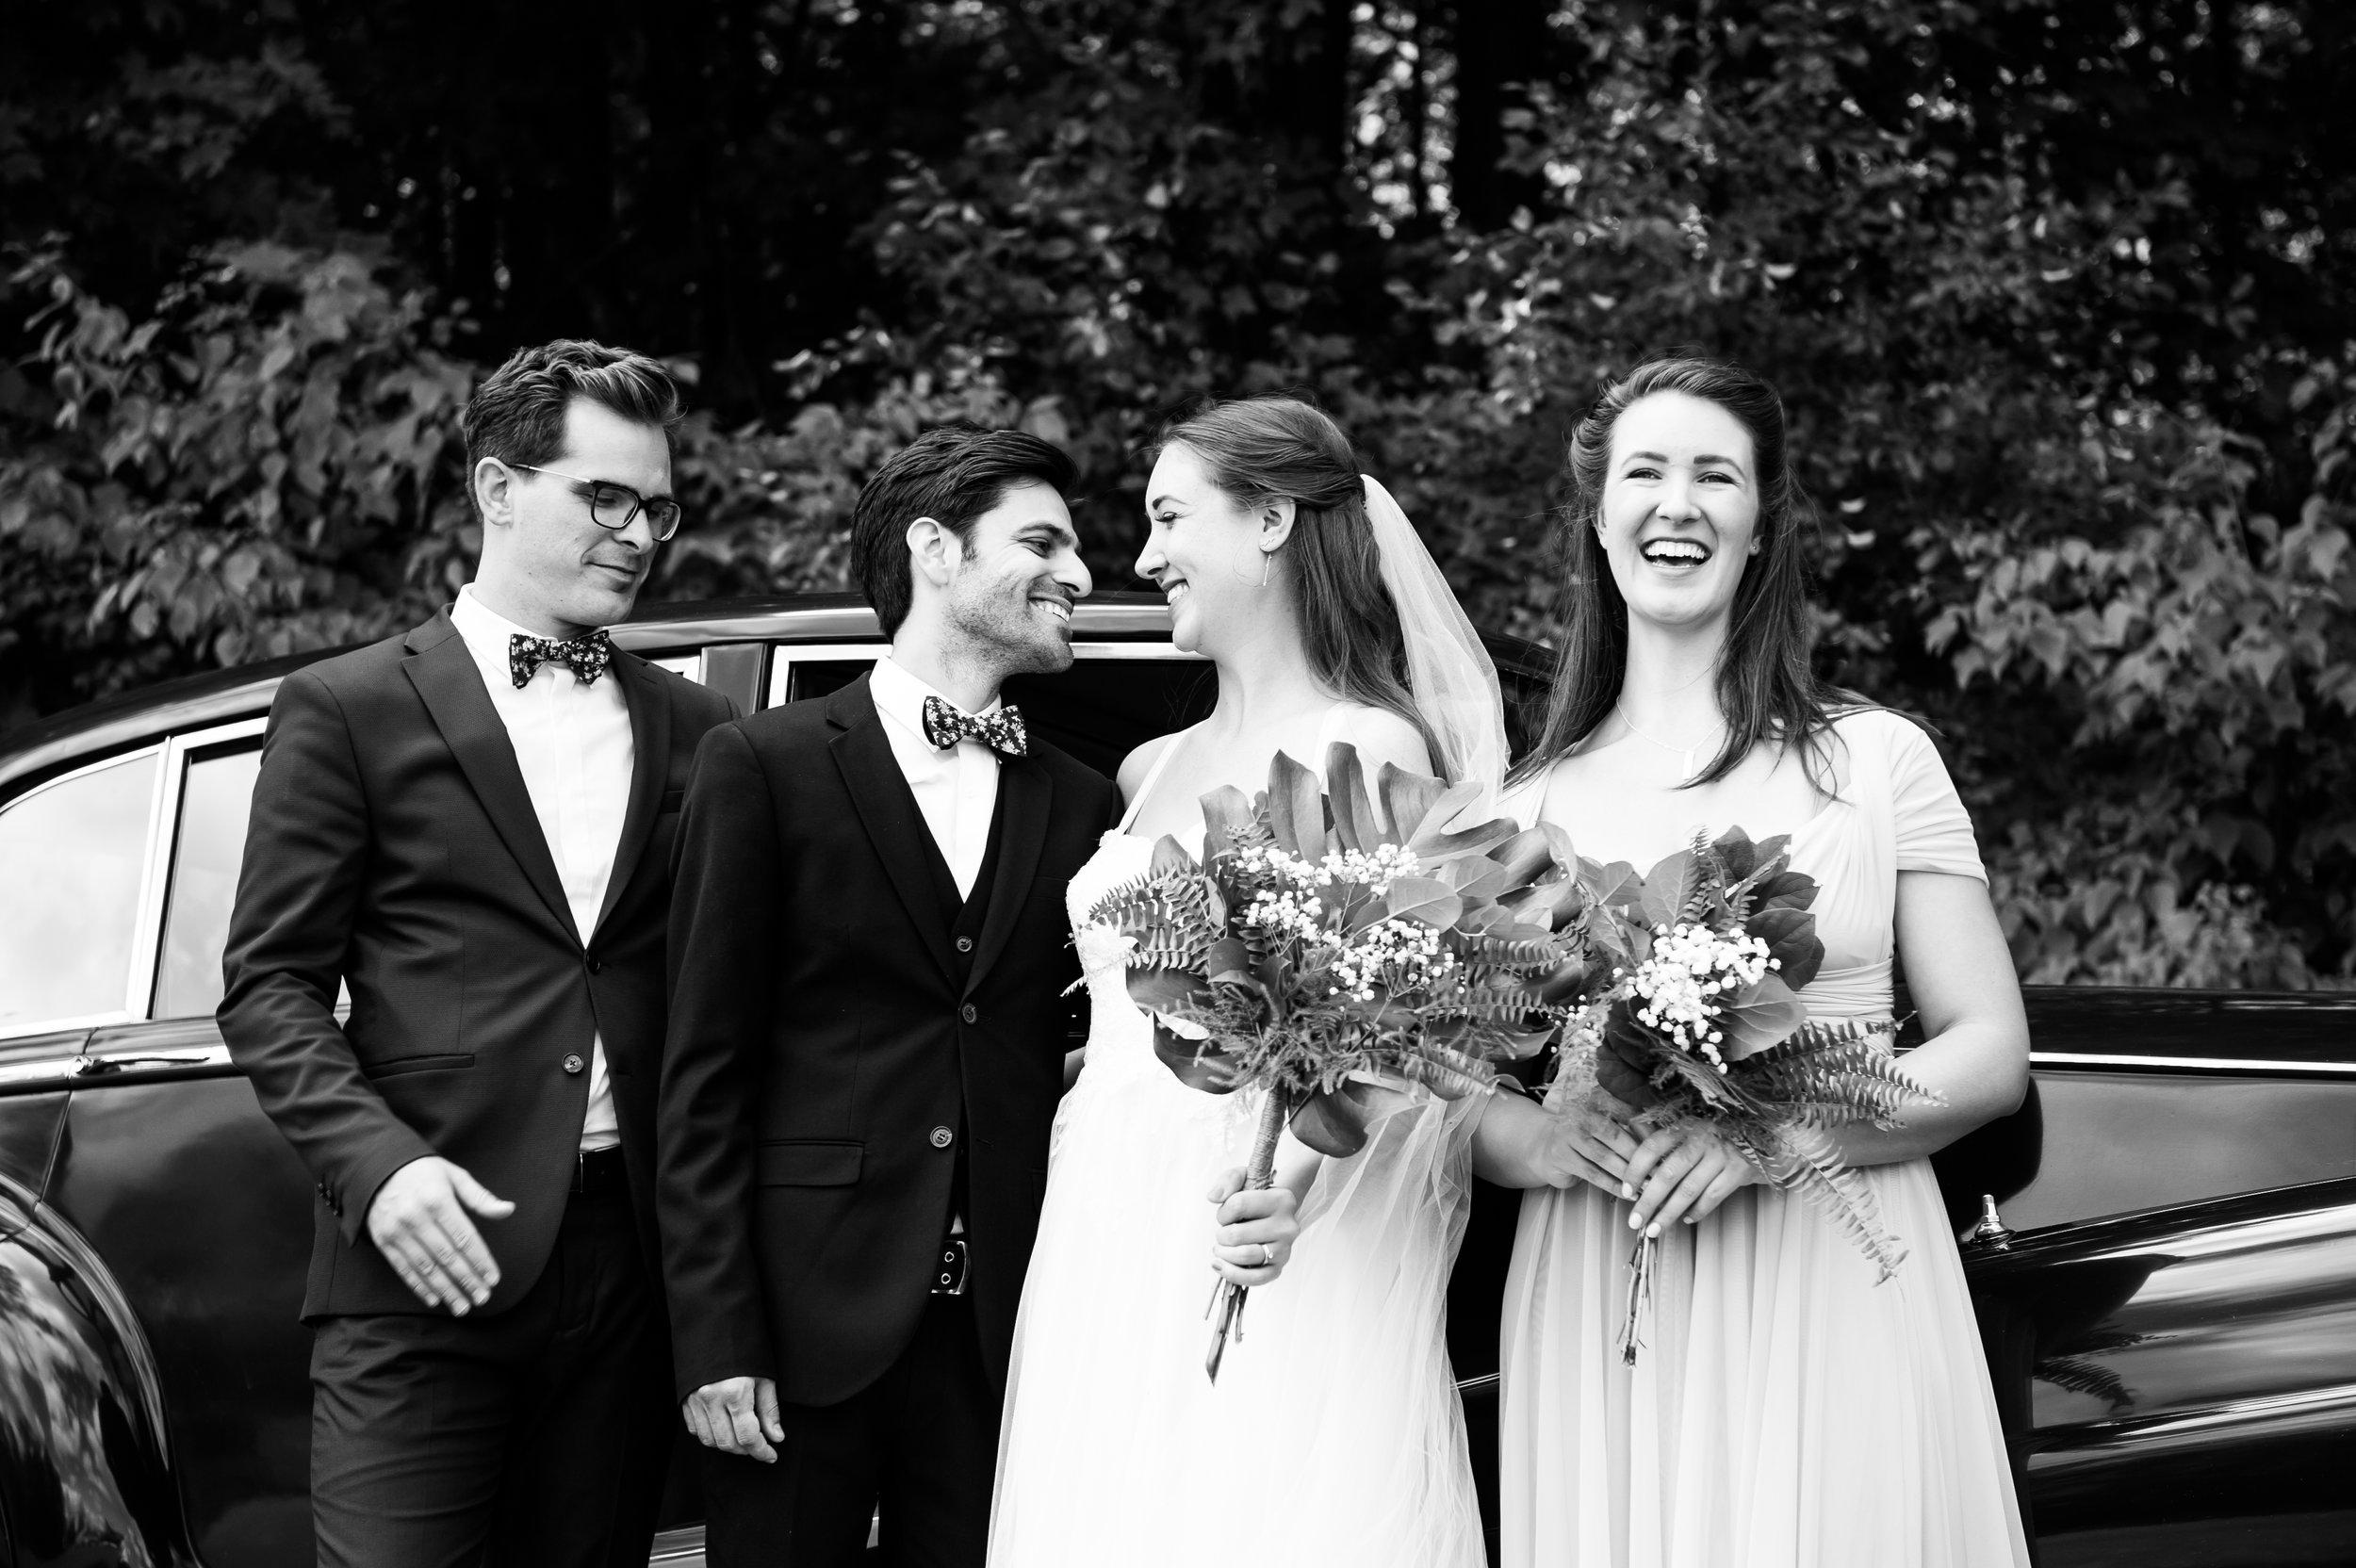 The wedding party.  // Wedding photos by Karmel Kreative // Plant Based Bride